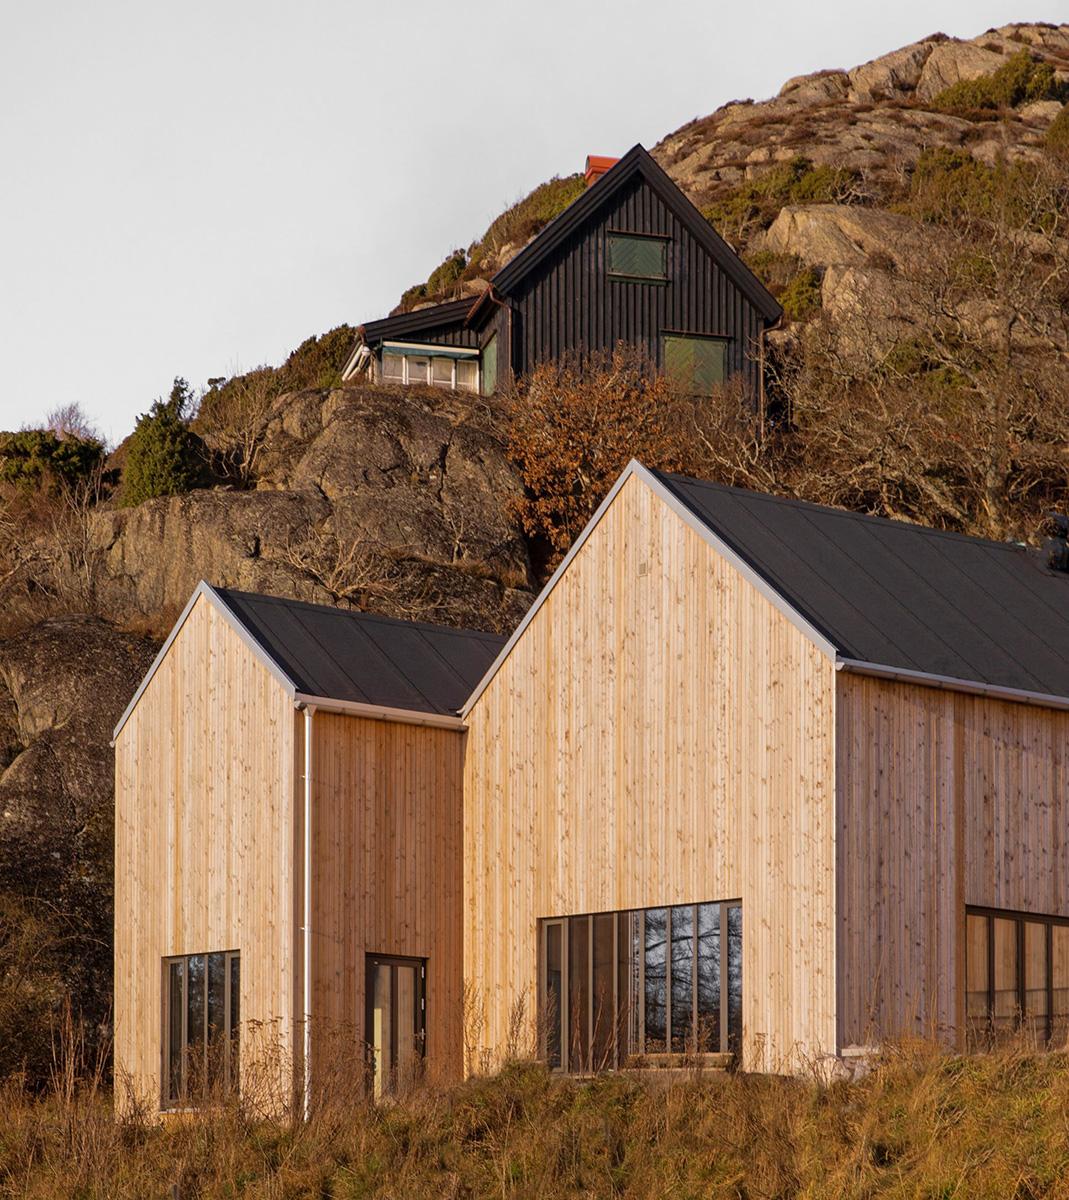 Archipelago-House-Norm-Architects-Jonas-Bjerre-Poulsen-01